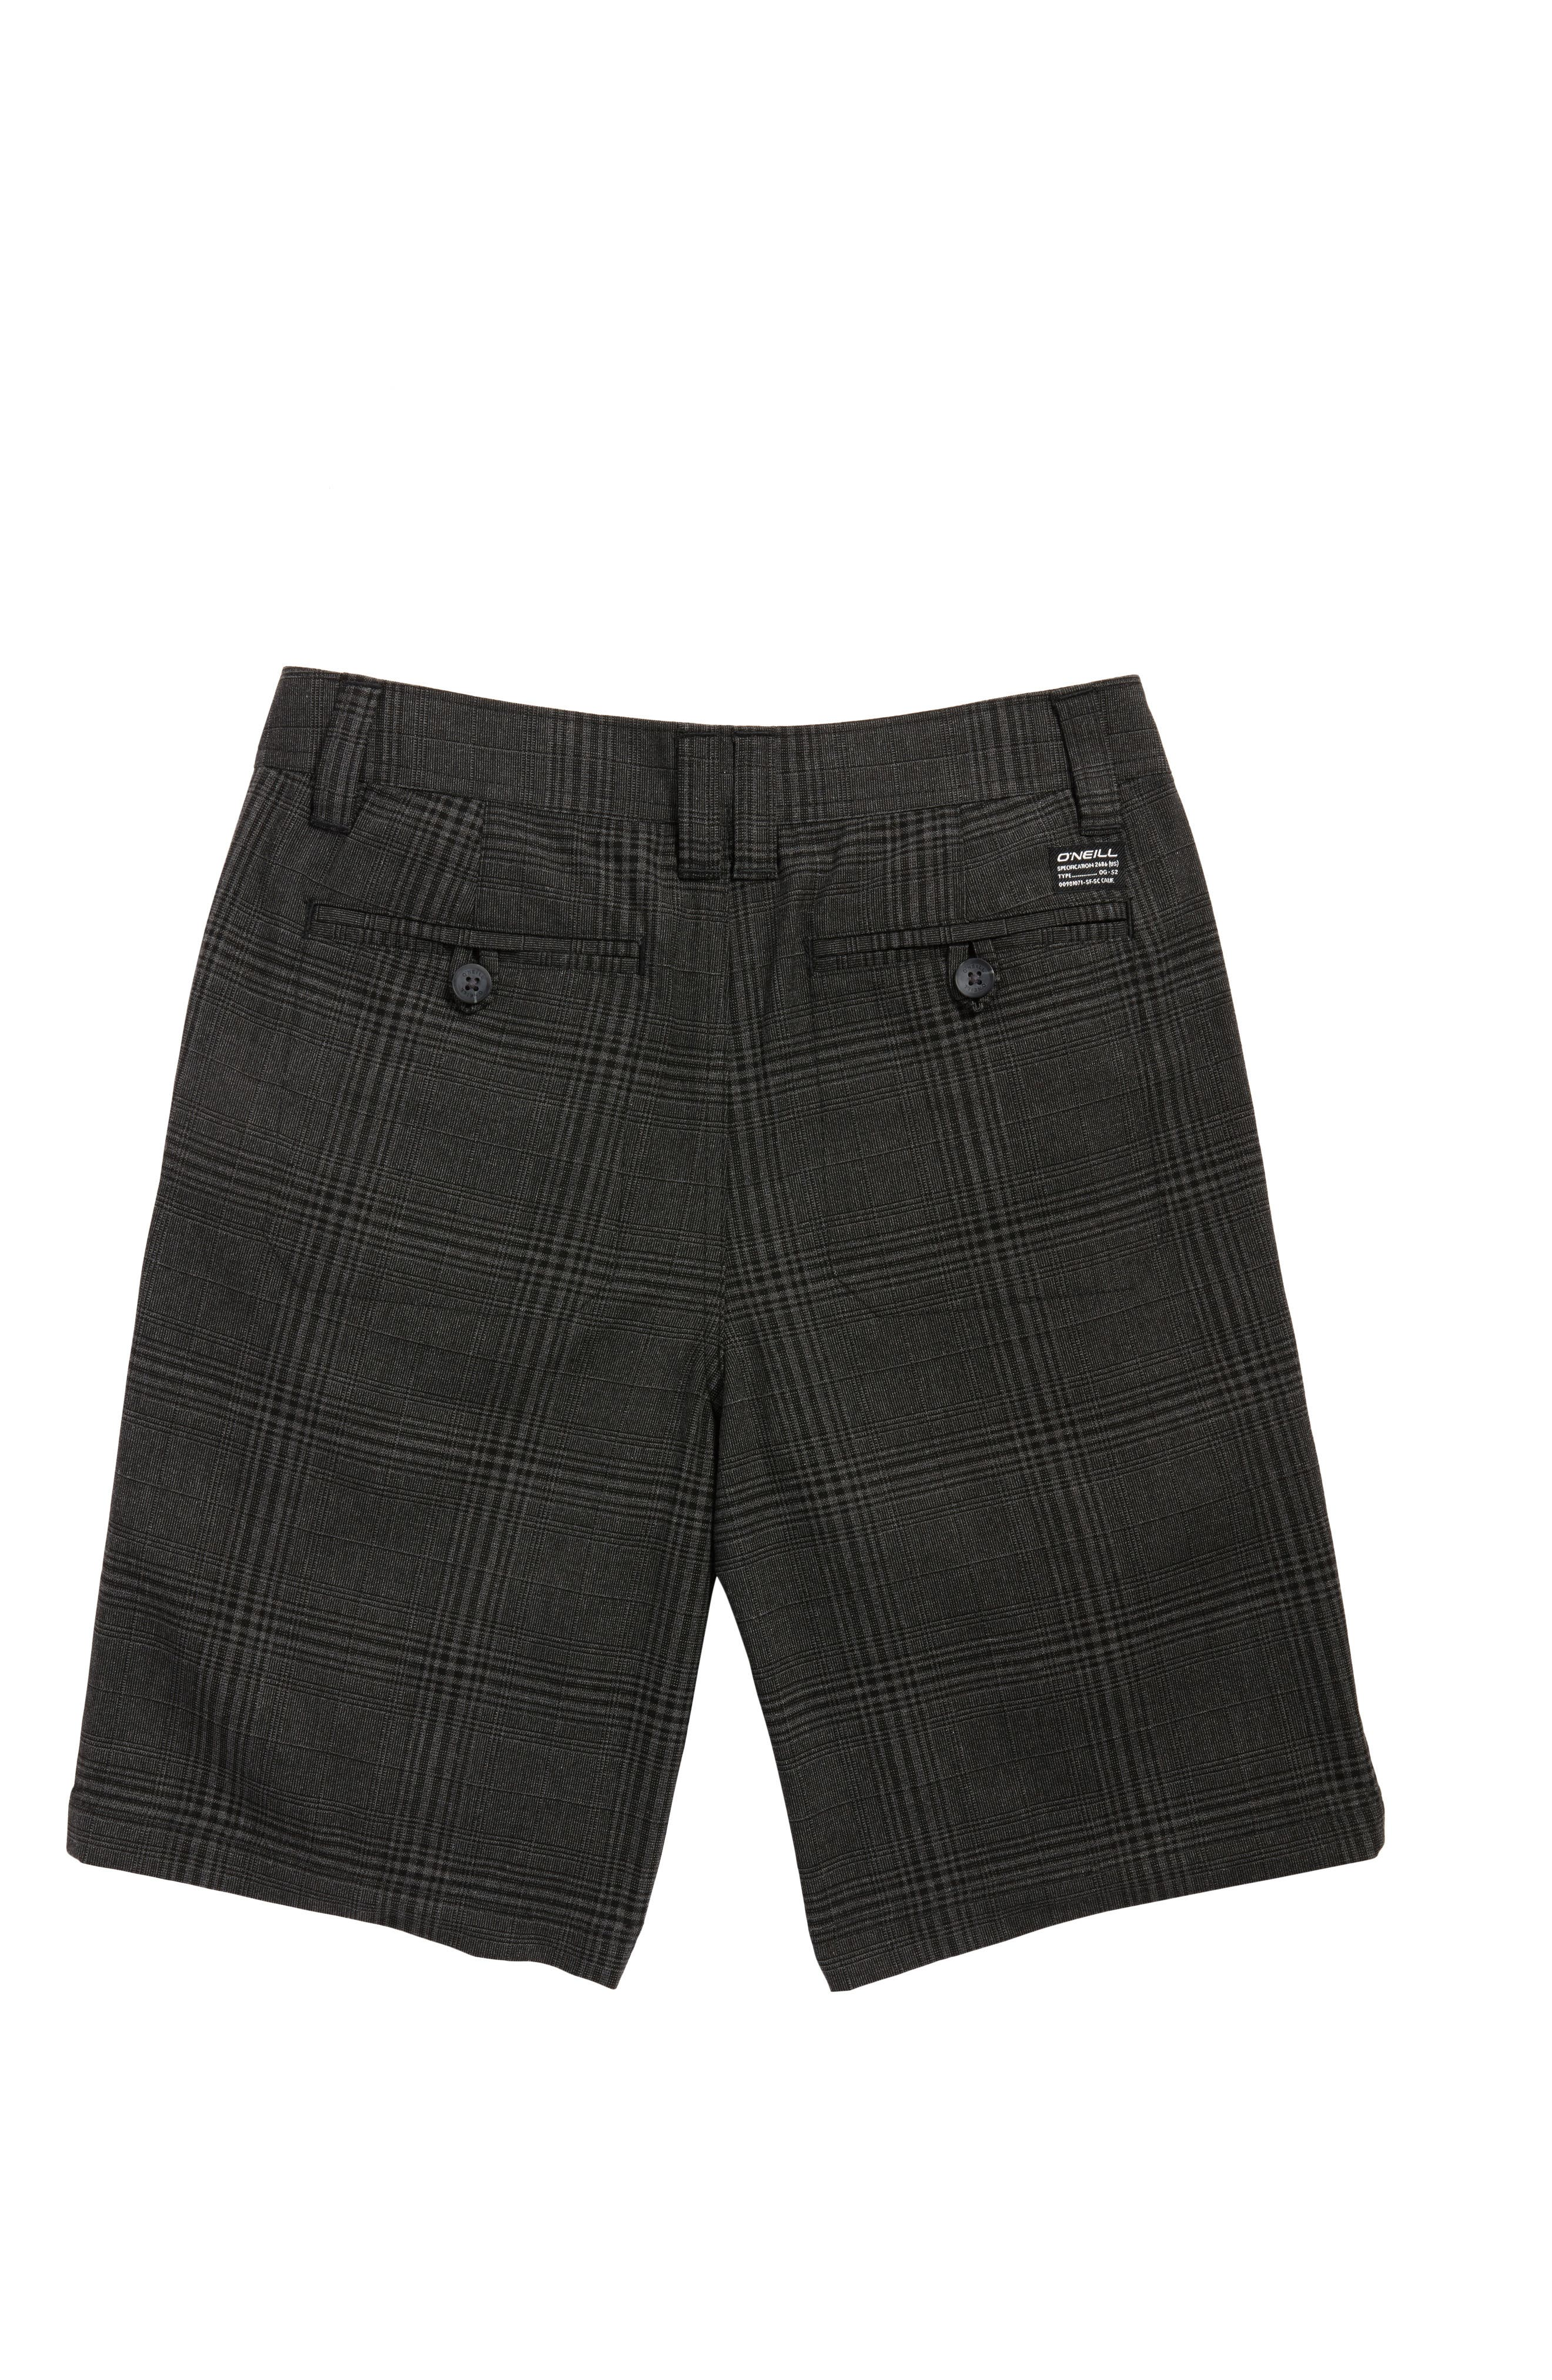 Alternate Image 2  - O'Neill Bristol Plaid Shorts (Big Boys)